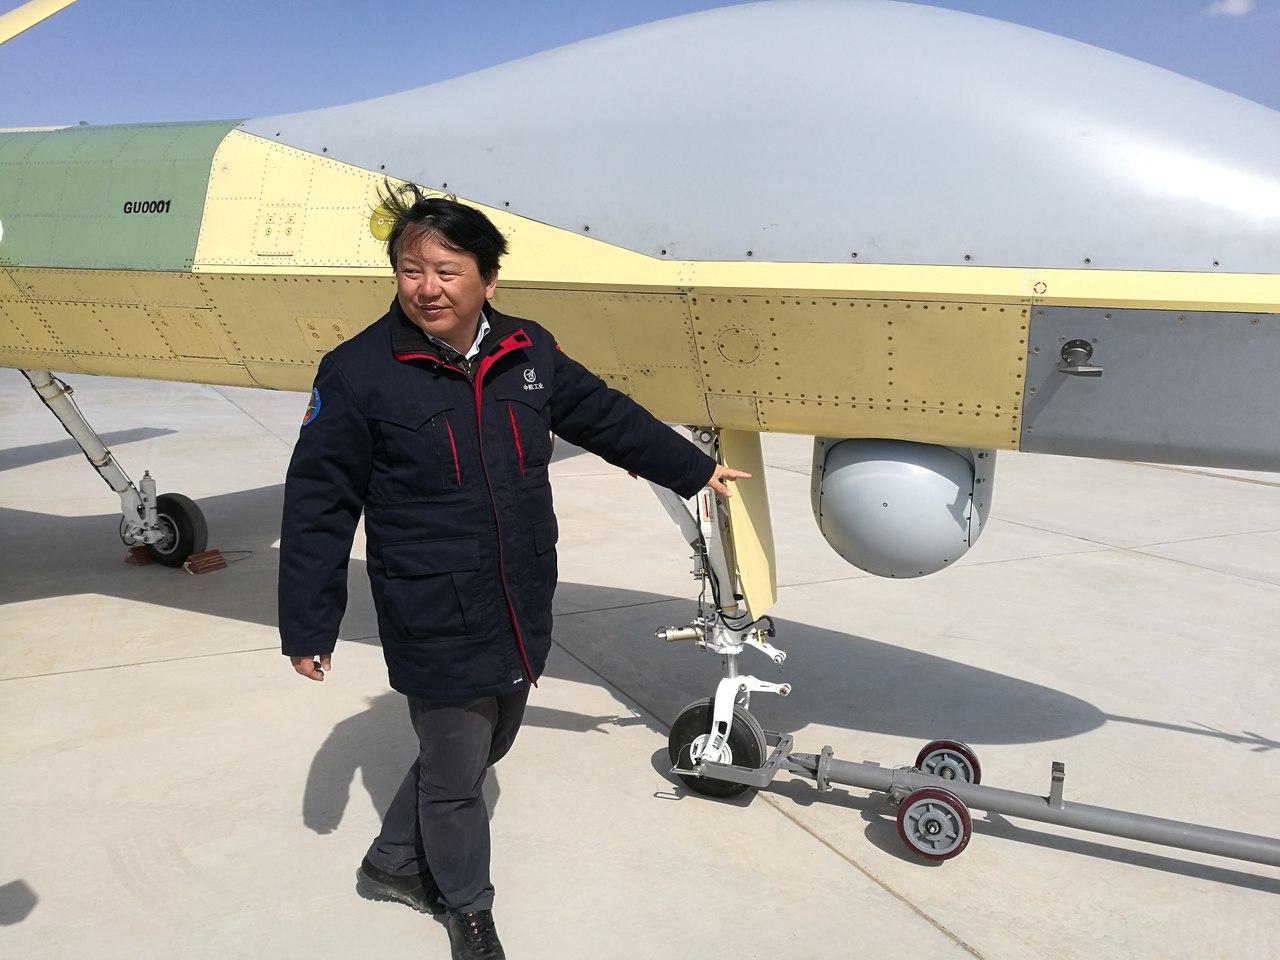 Kínai haderő -5vXno2d-gc